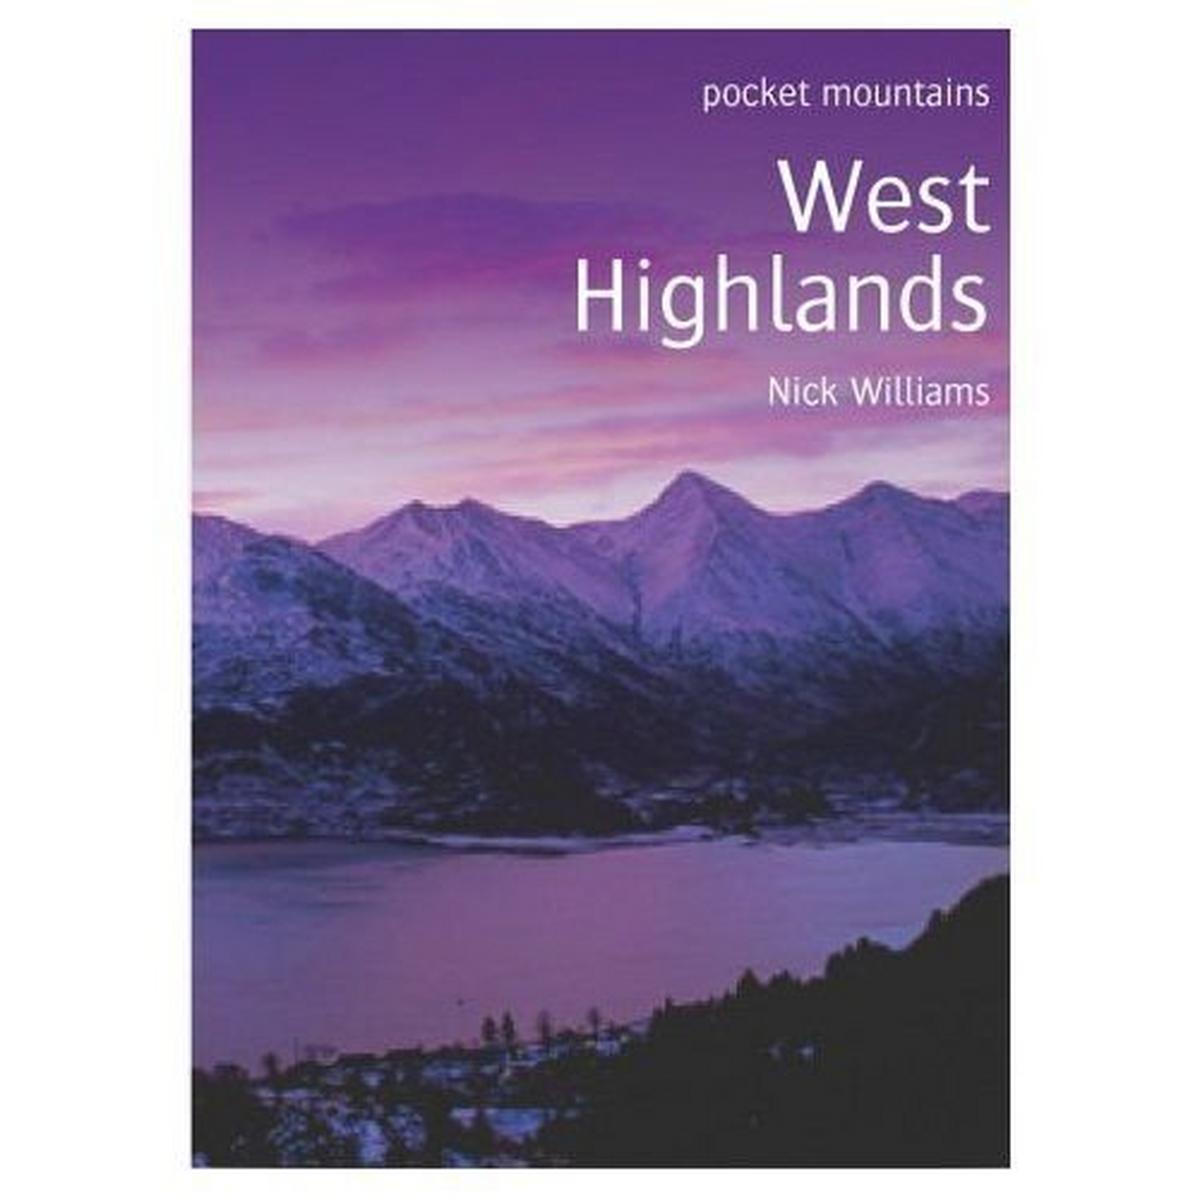 Cordee West Highlands (Pocket Mountains) Guidebook